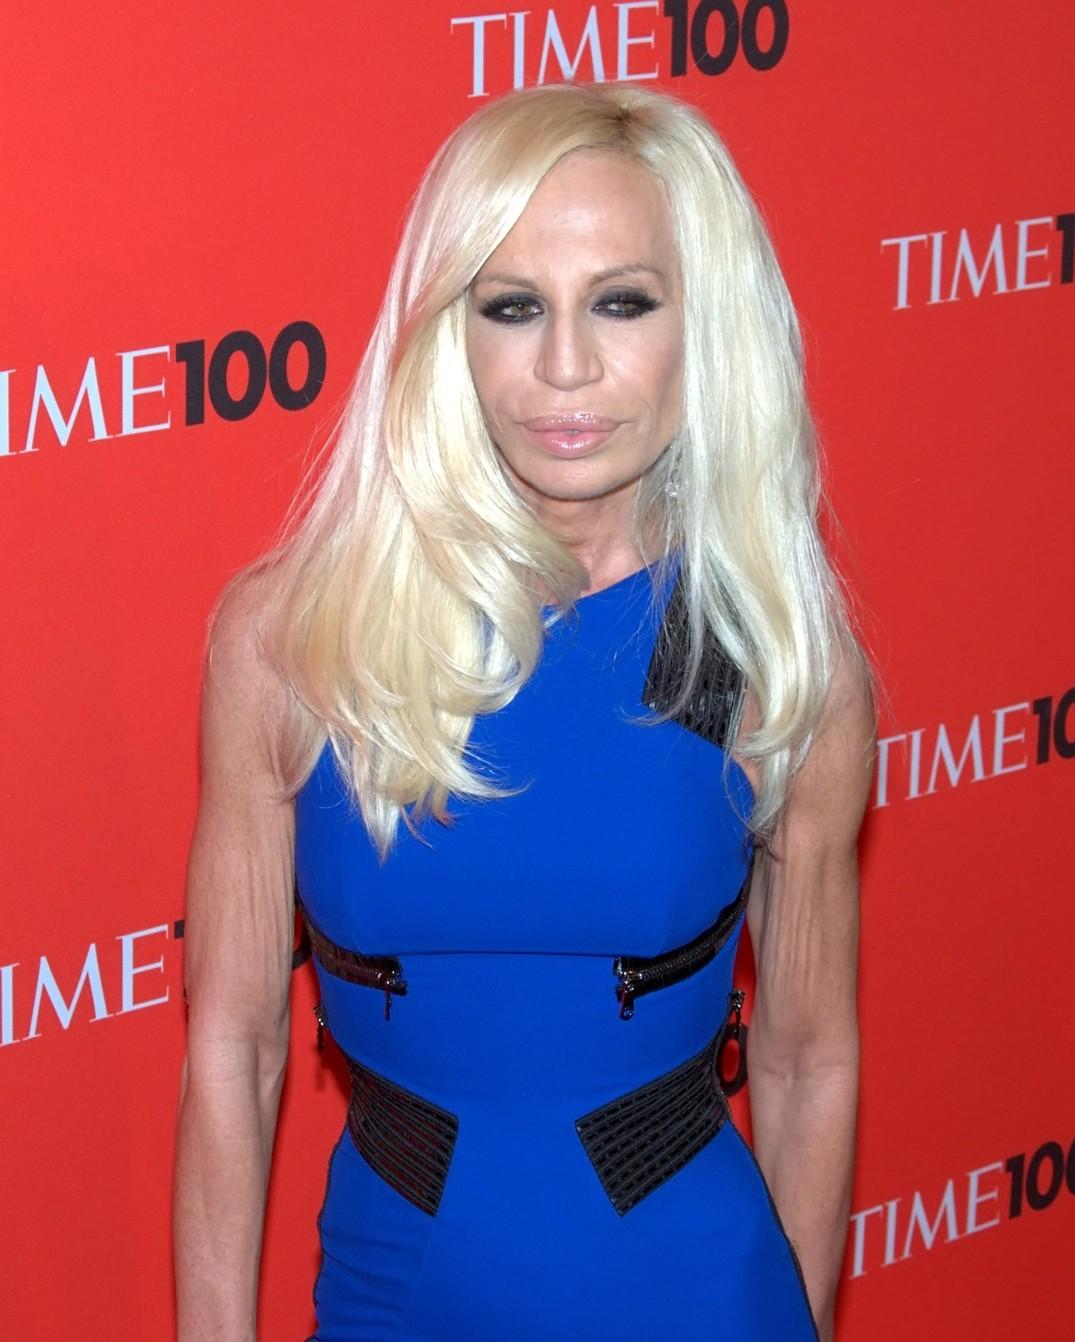 Donatella_Versace_2010_Time_Shankbone_popfashionews